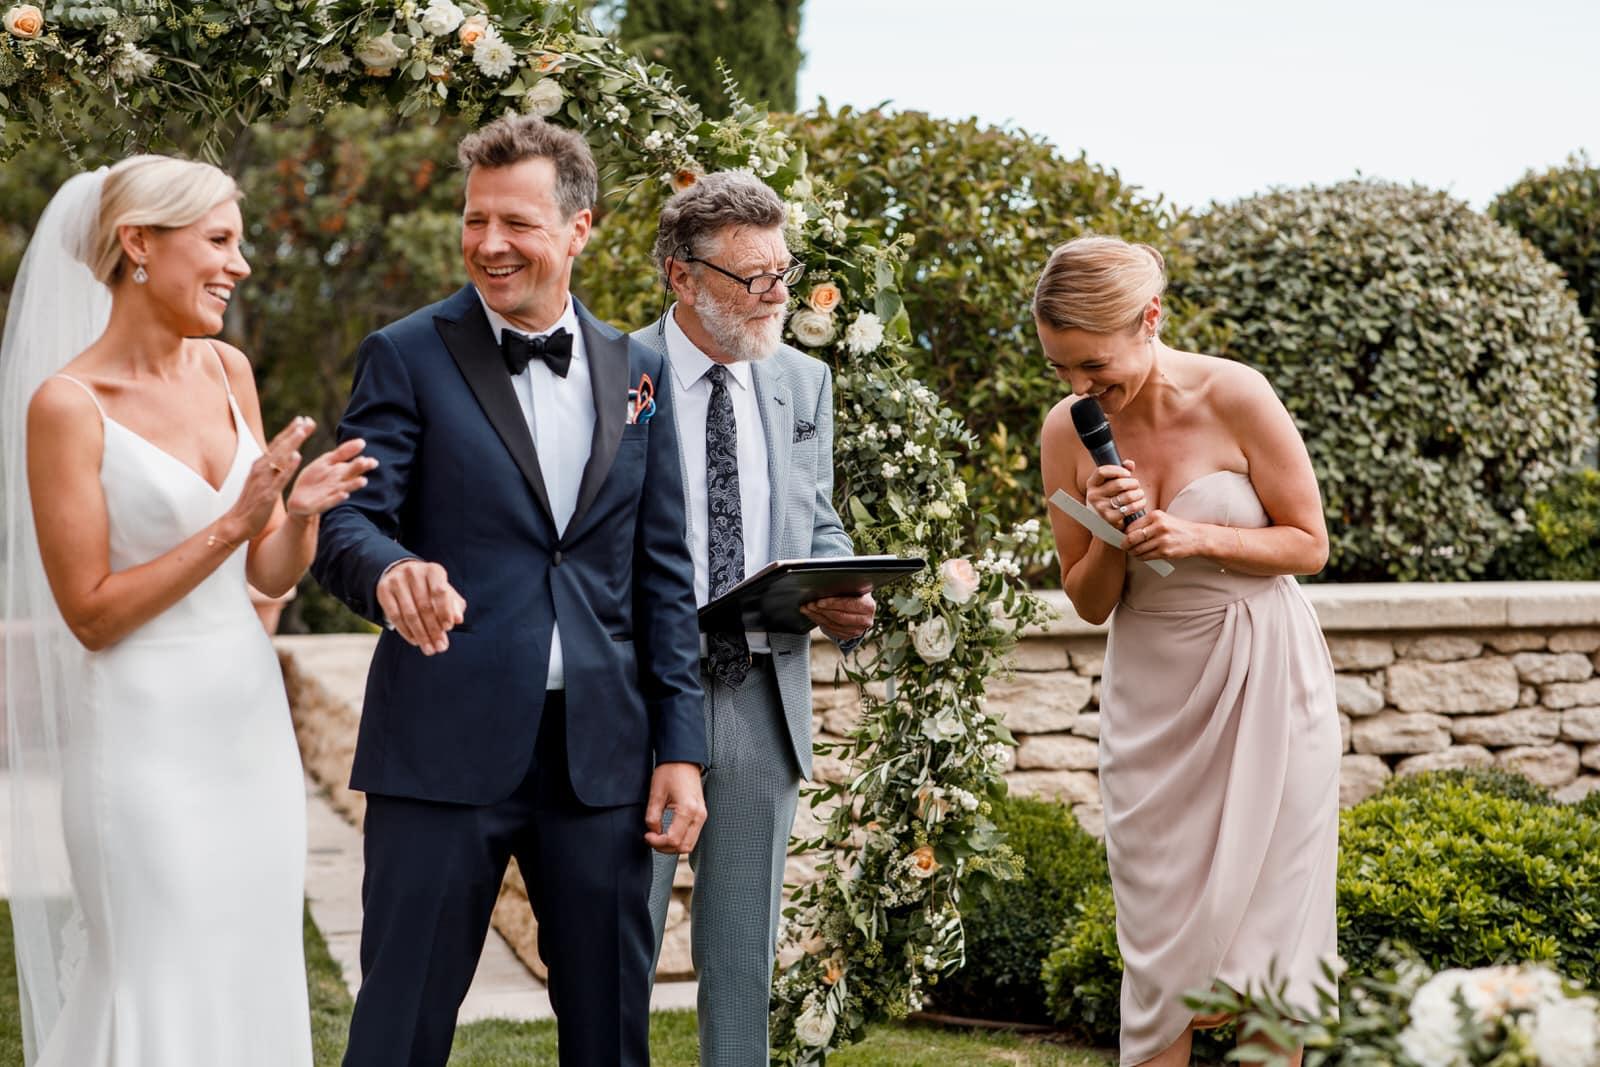 wedding reading at garden in airelles hotel wedding